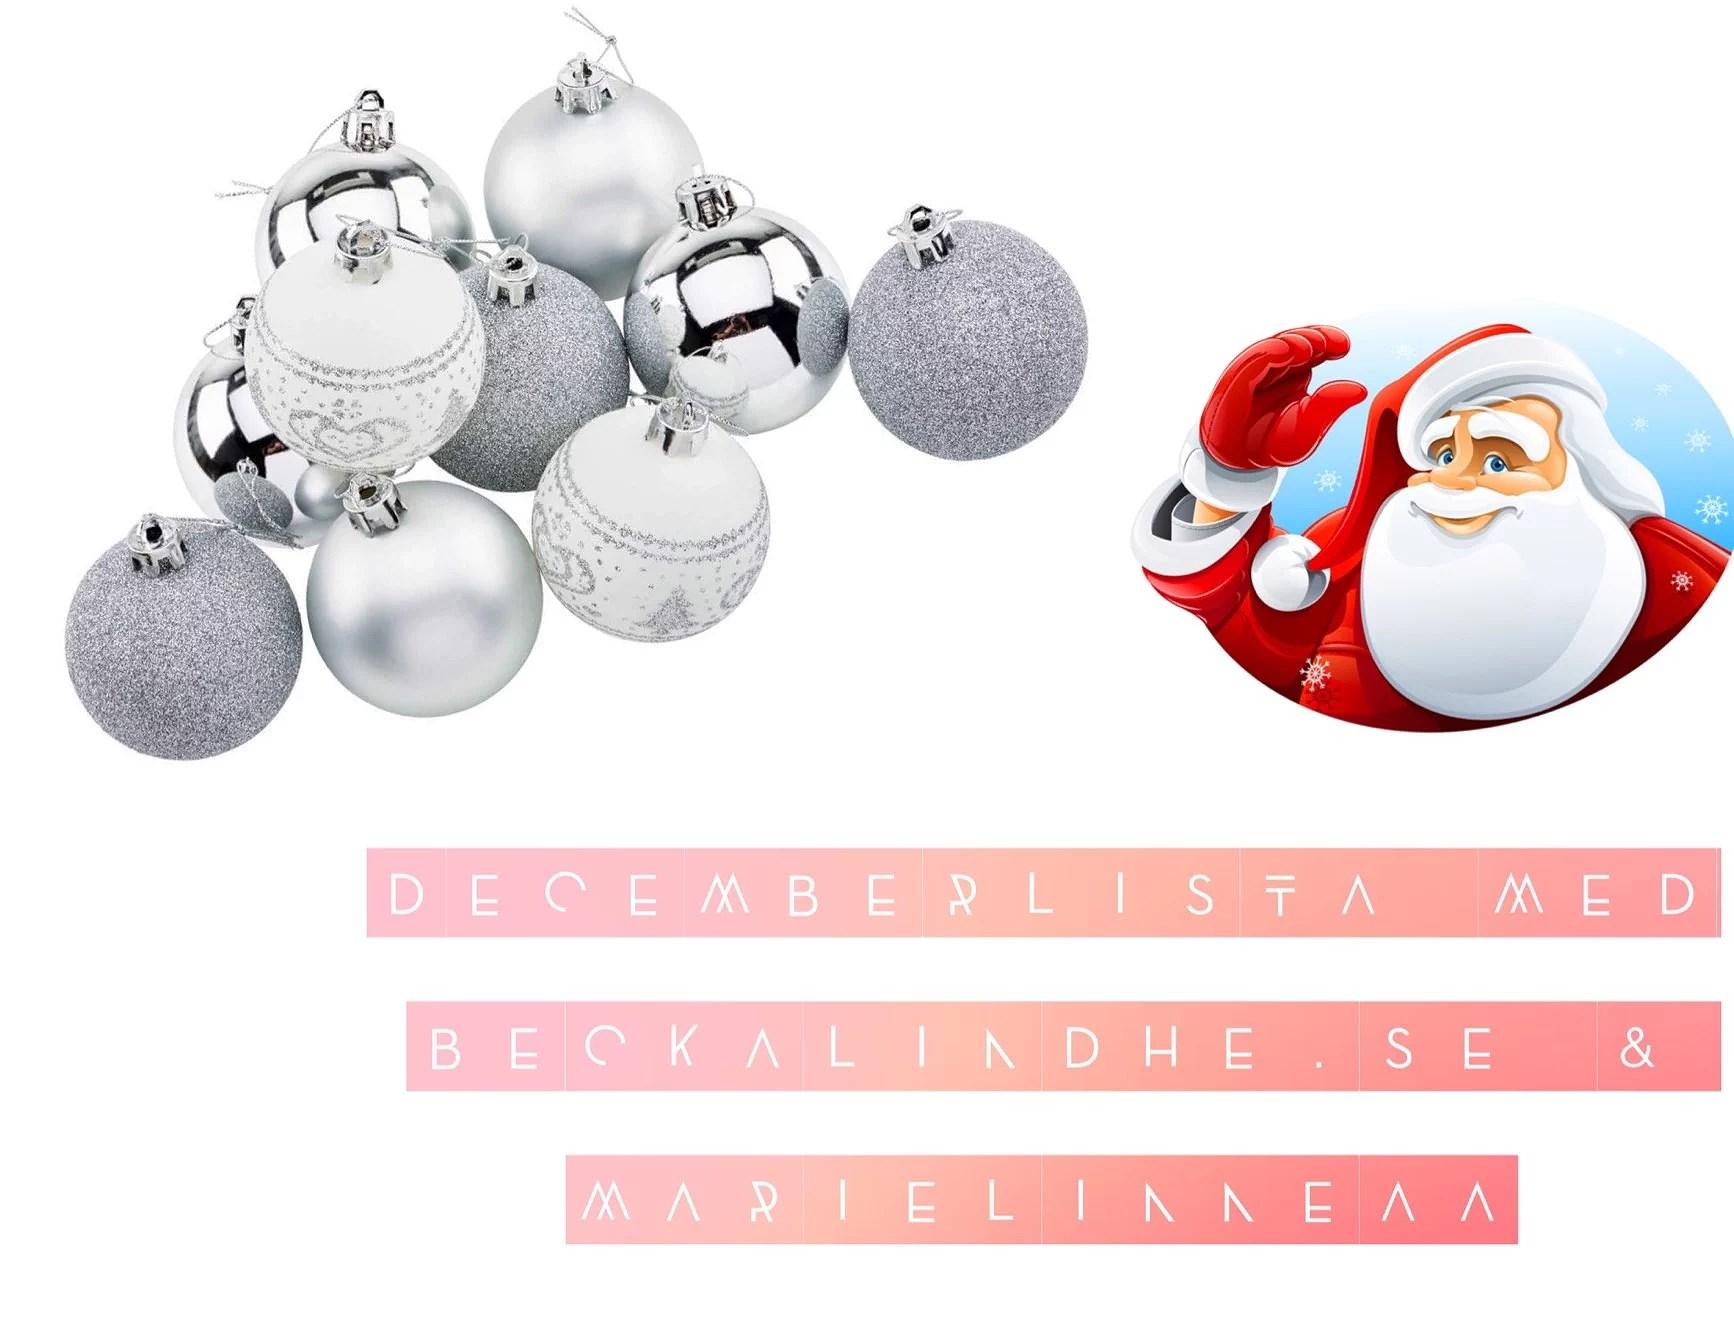 Decemberlista dag 13